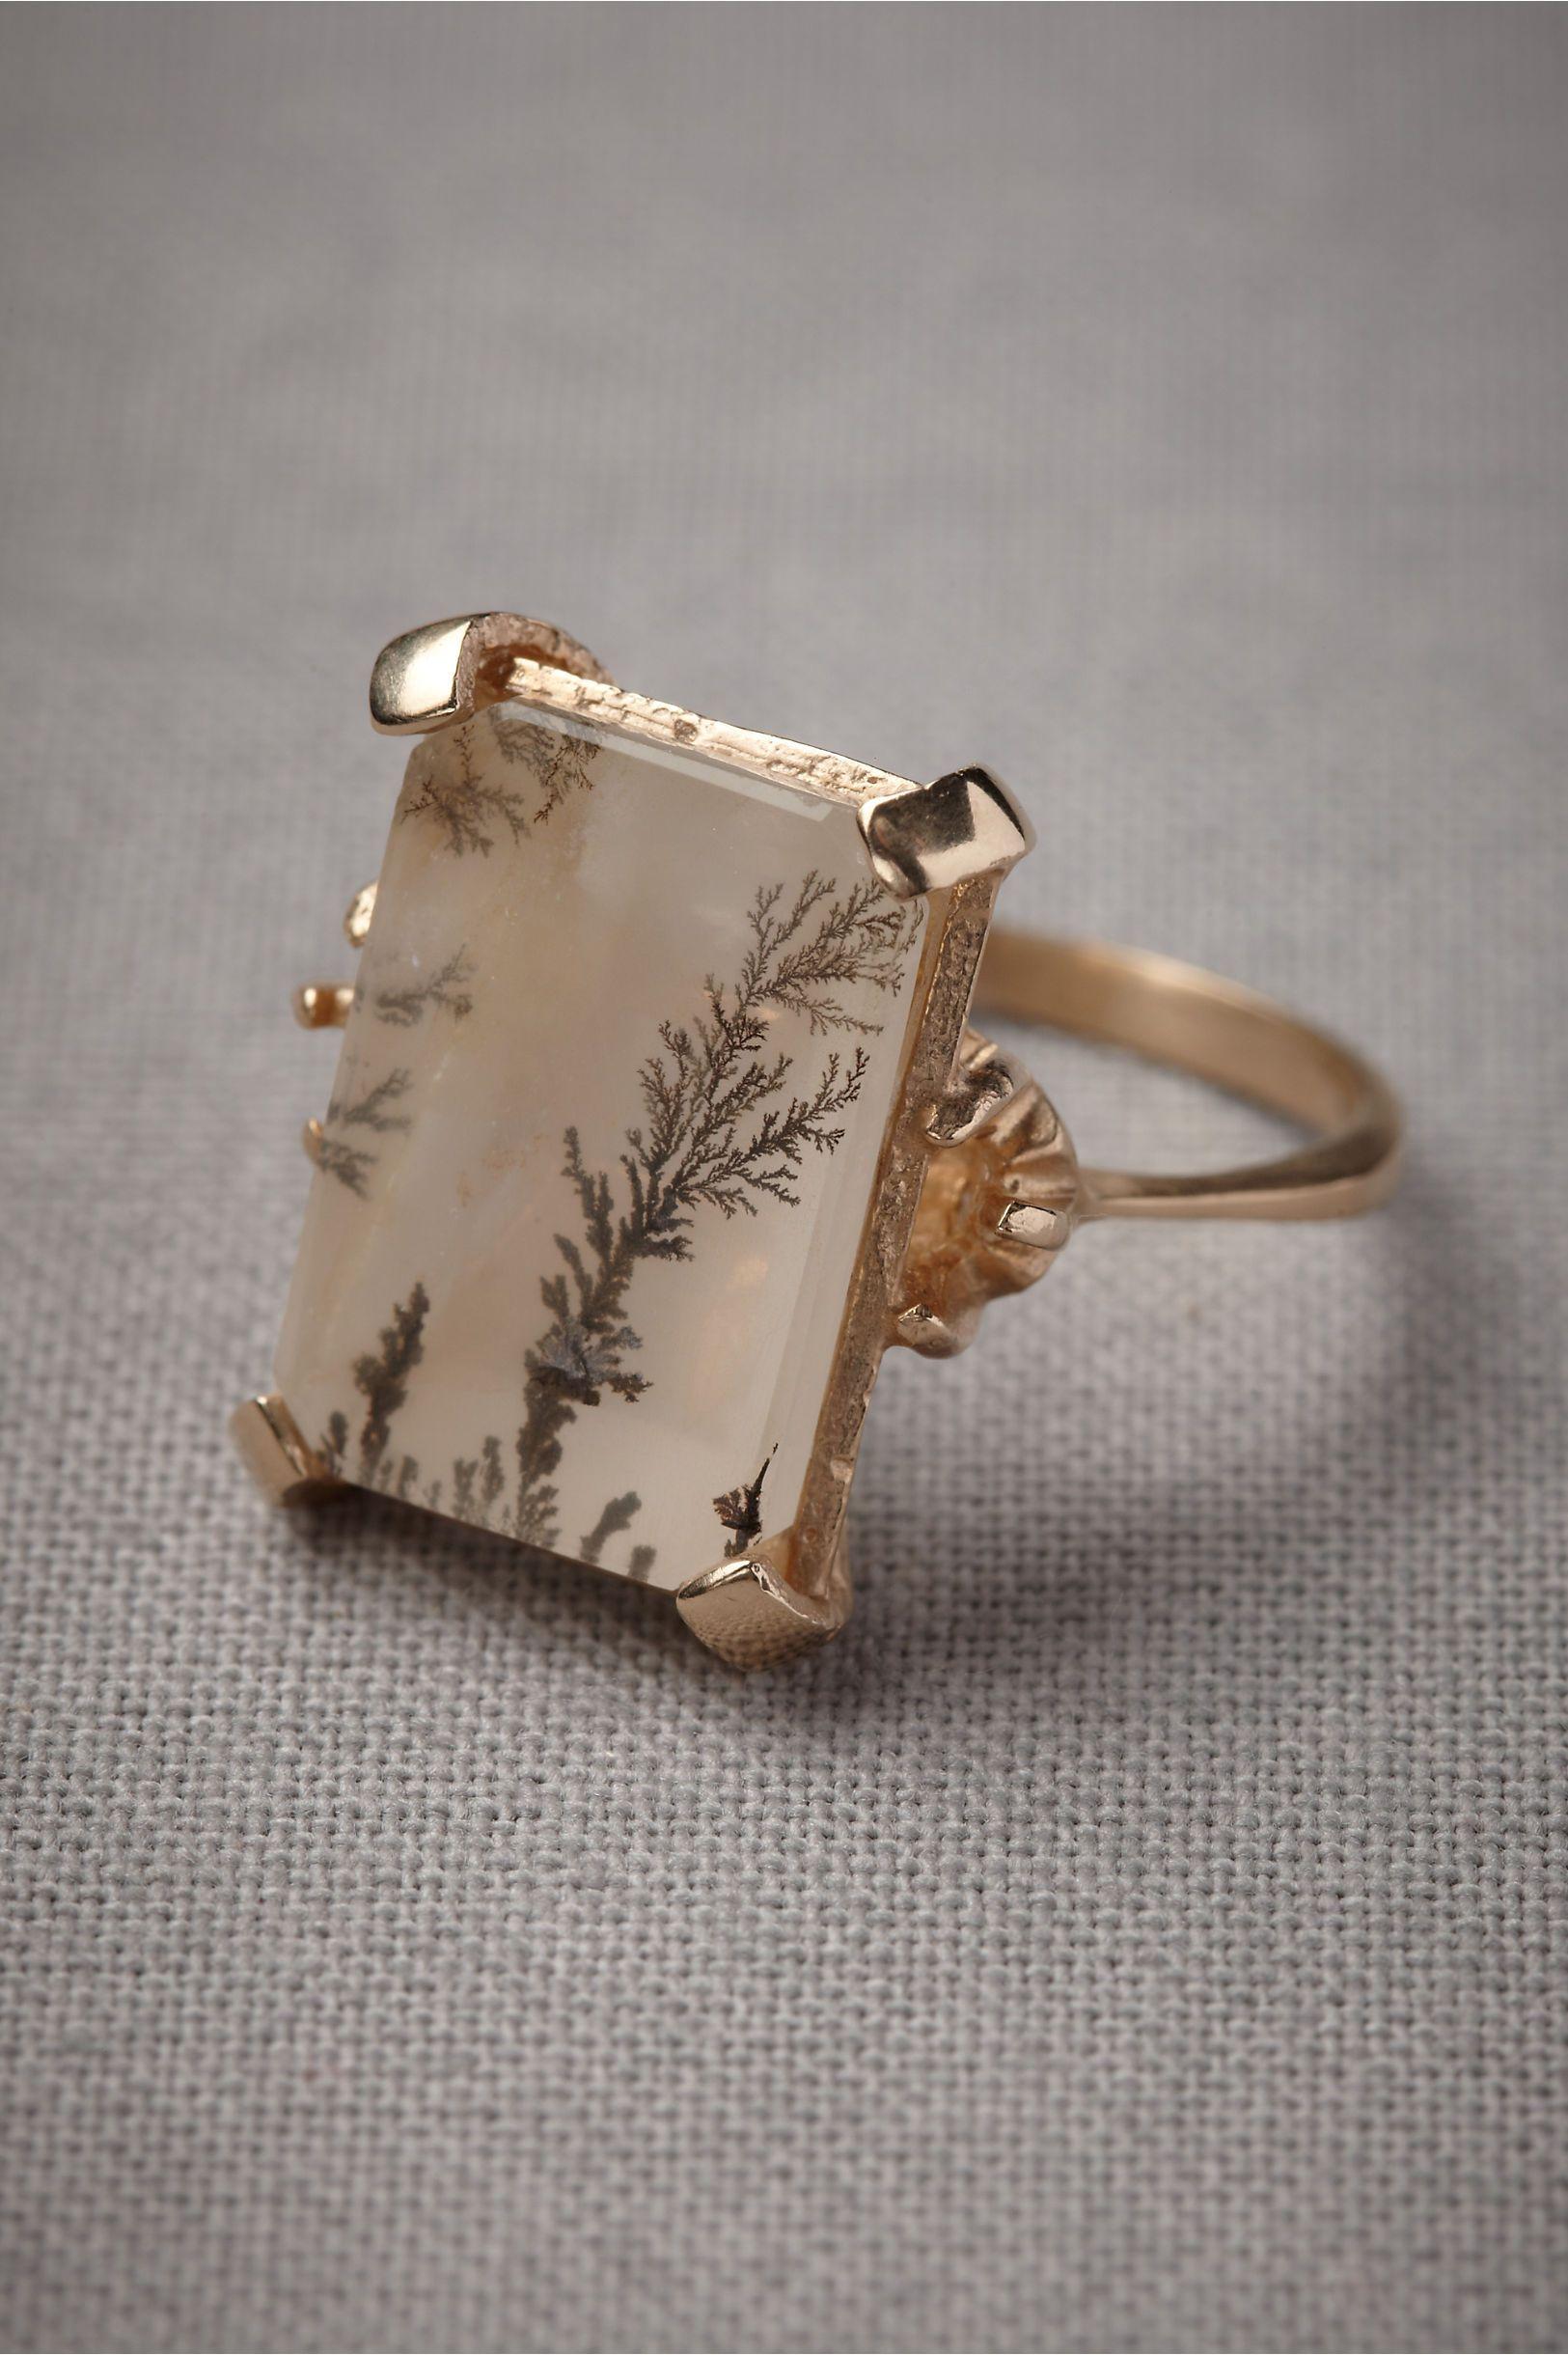 Handmade Silver Jewelry 31 Gemstone Ring Natural Dendrite Ring Ring Size 7 Silver Ring Dendrite Ring Stacking Ring Bezel set ring